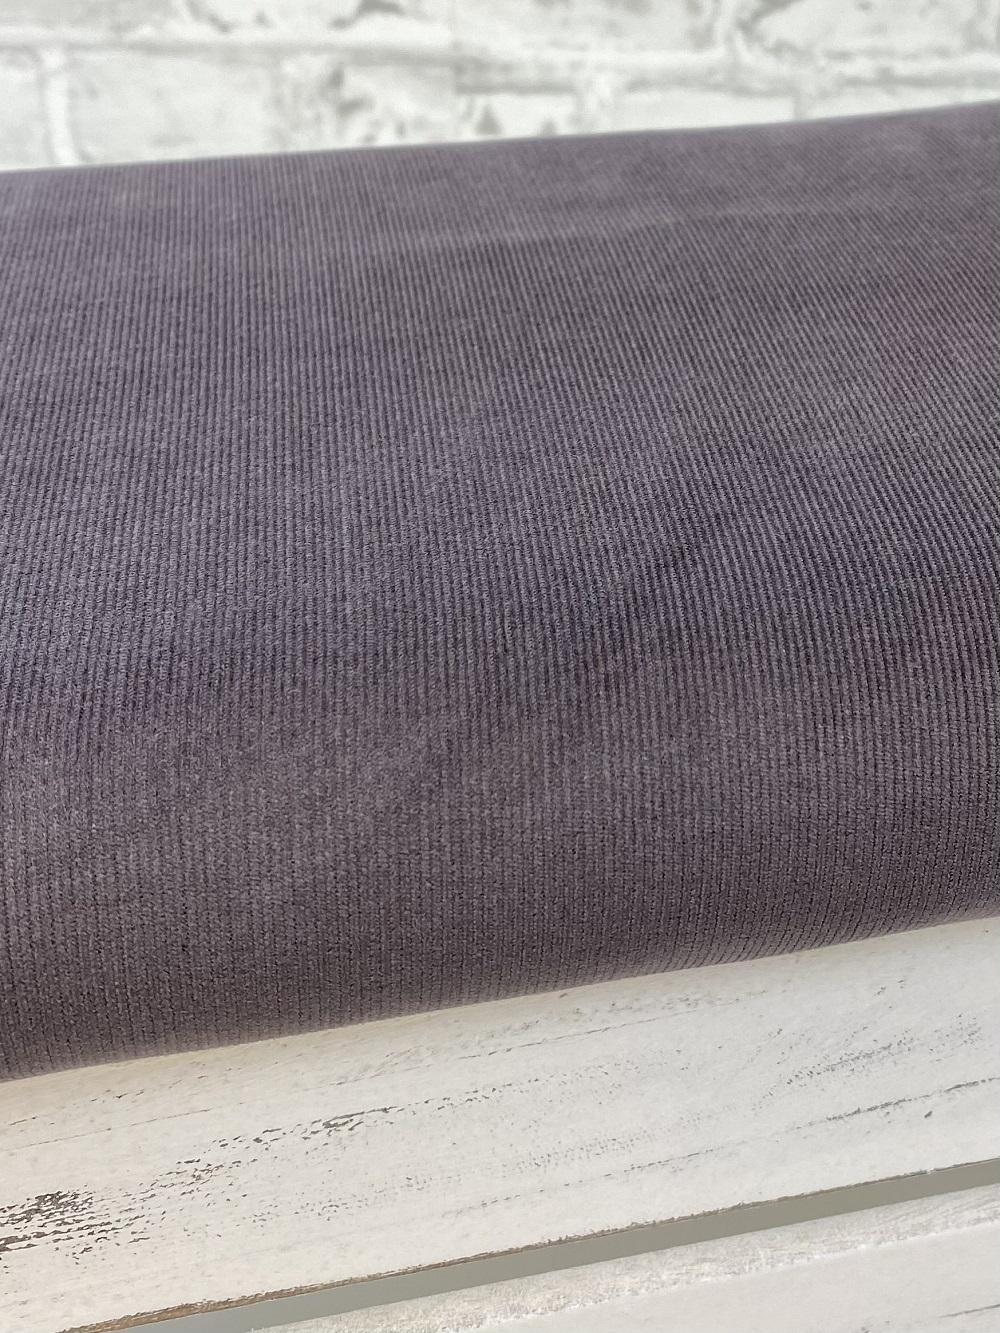 Feincord gewaschen, dunkelgrau. Art. 4809/68